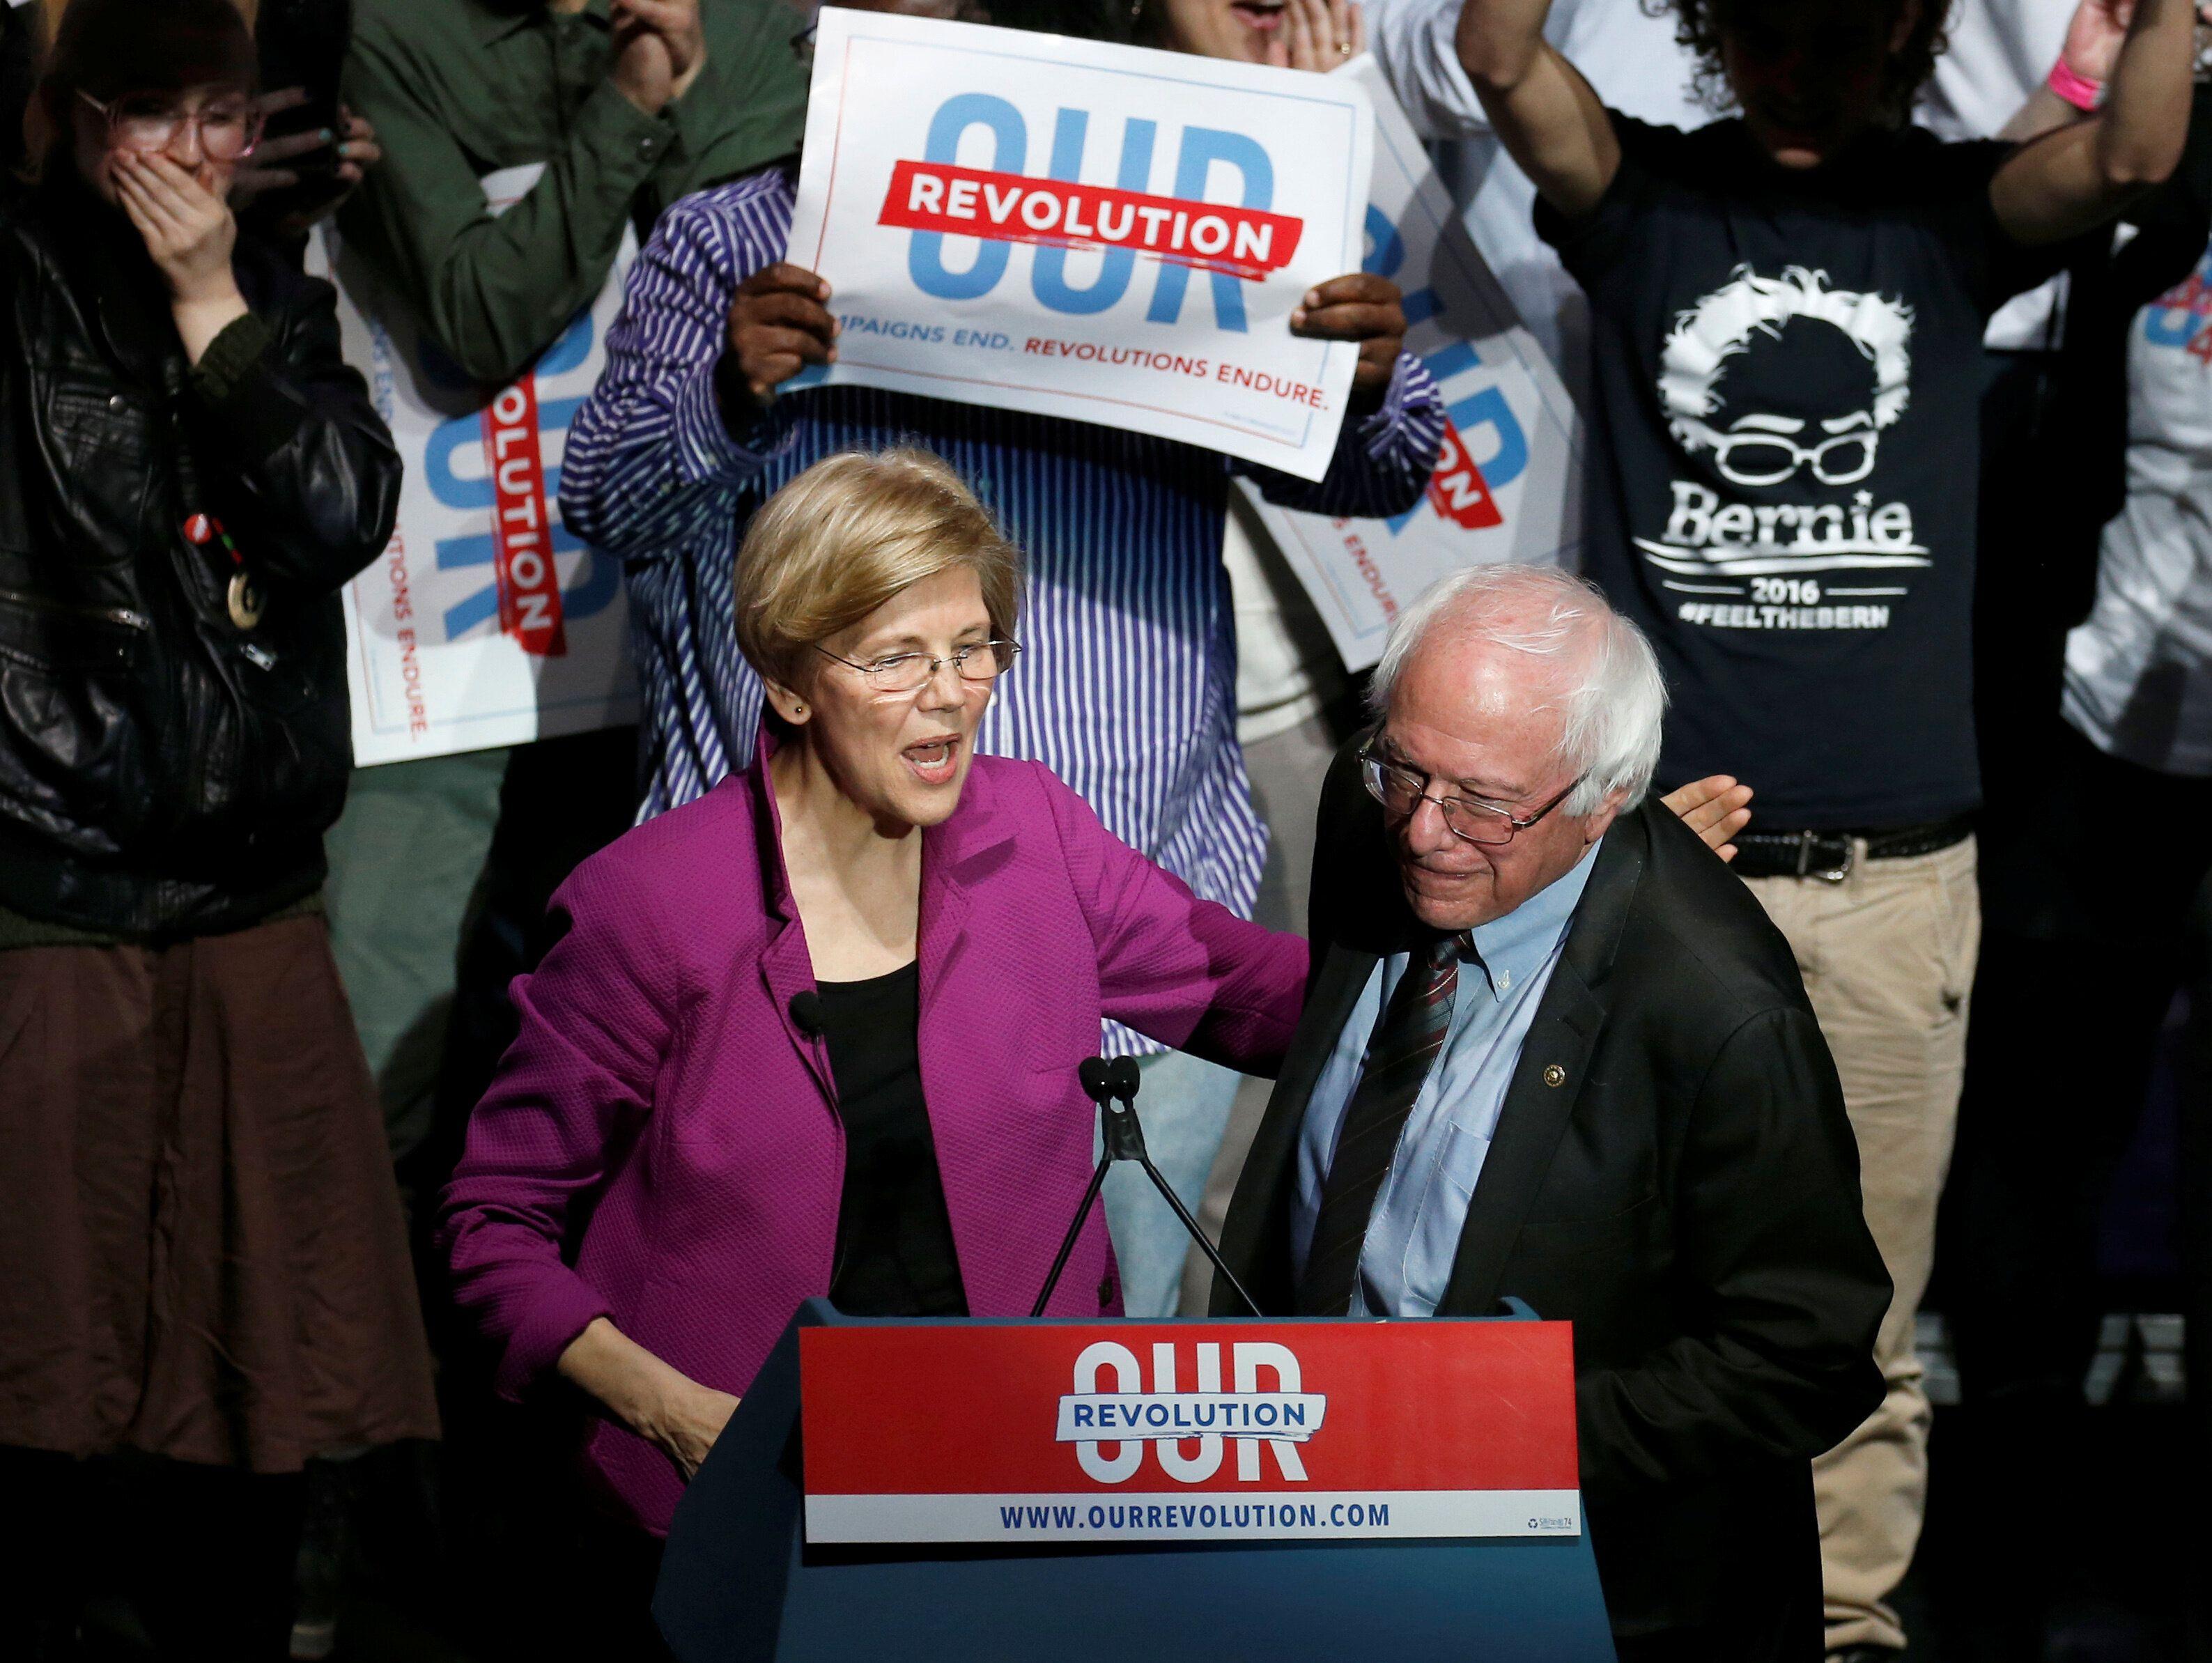 Sen. Elizabeth Warren (D-Mass.) and Sen. Bernie Sanders (I-Vt.), both contenders for the 2020 Democratic presidential nominat